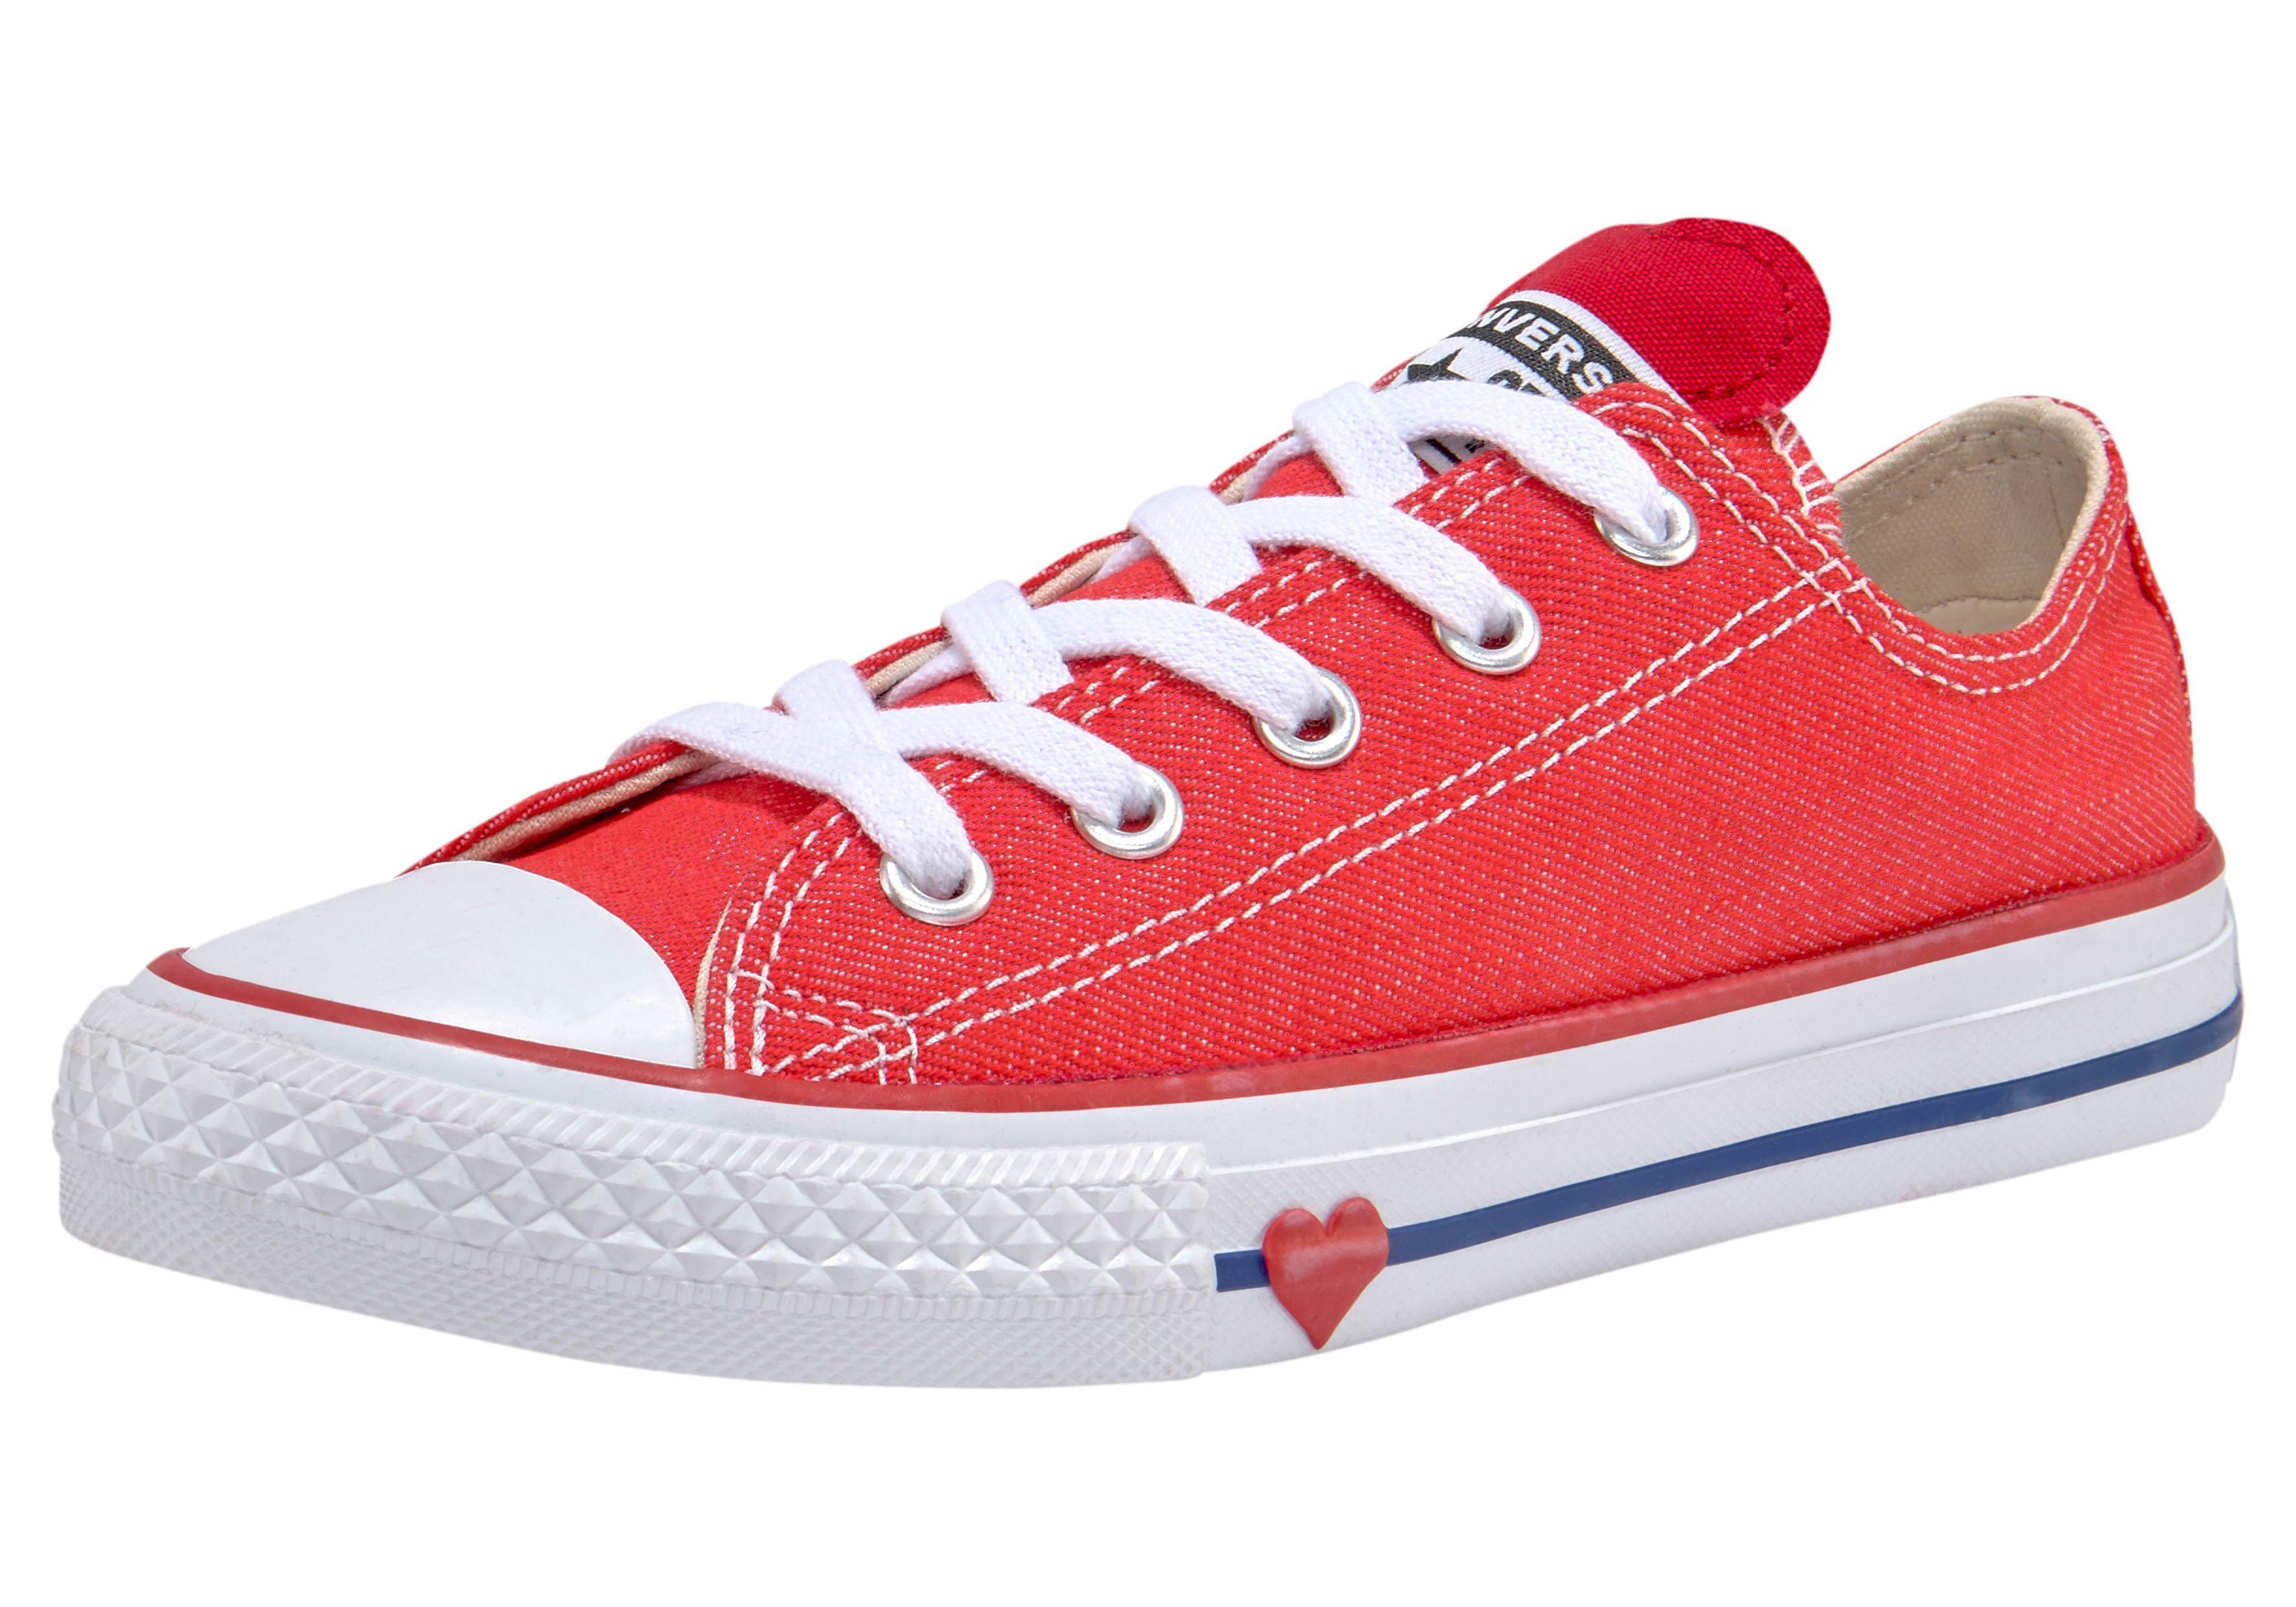 57221ad5043 Converse Sneaker »CHUCK TAYLOR ALL STAR - OX« online kaufen | BAUR